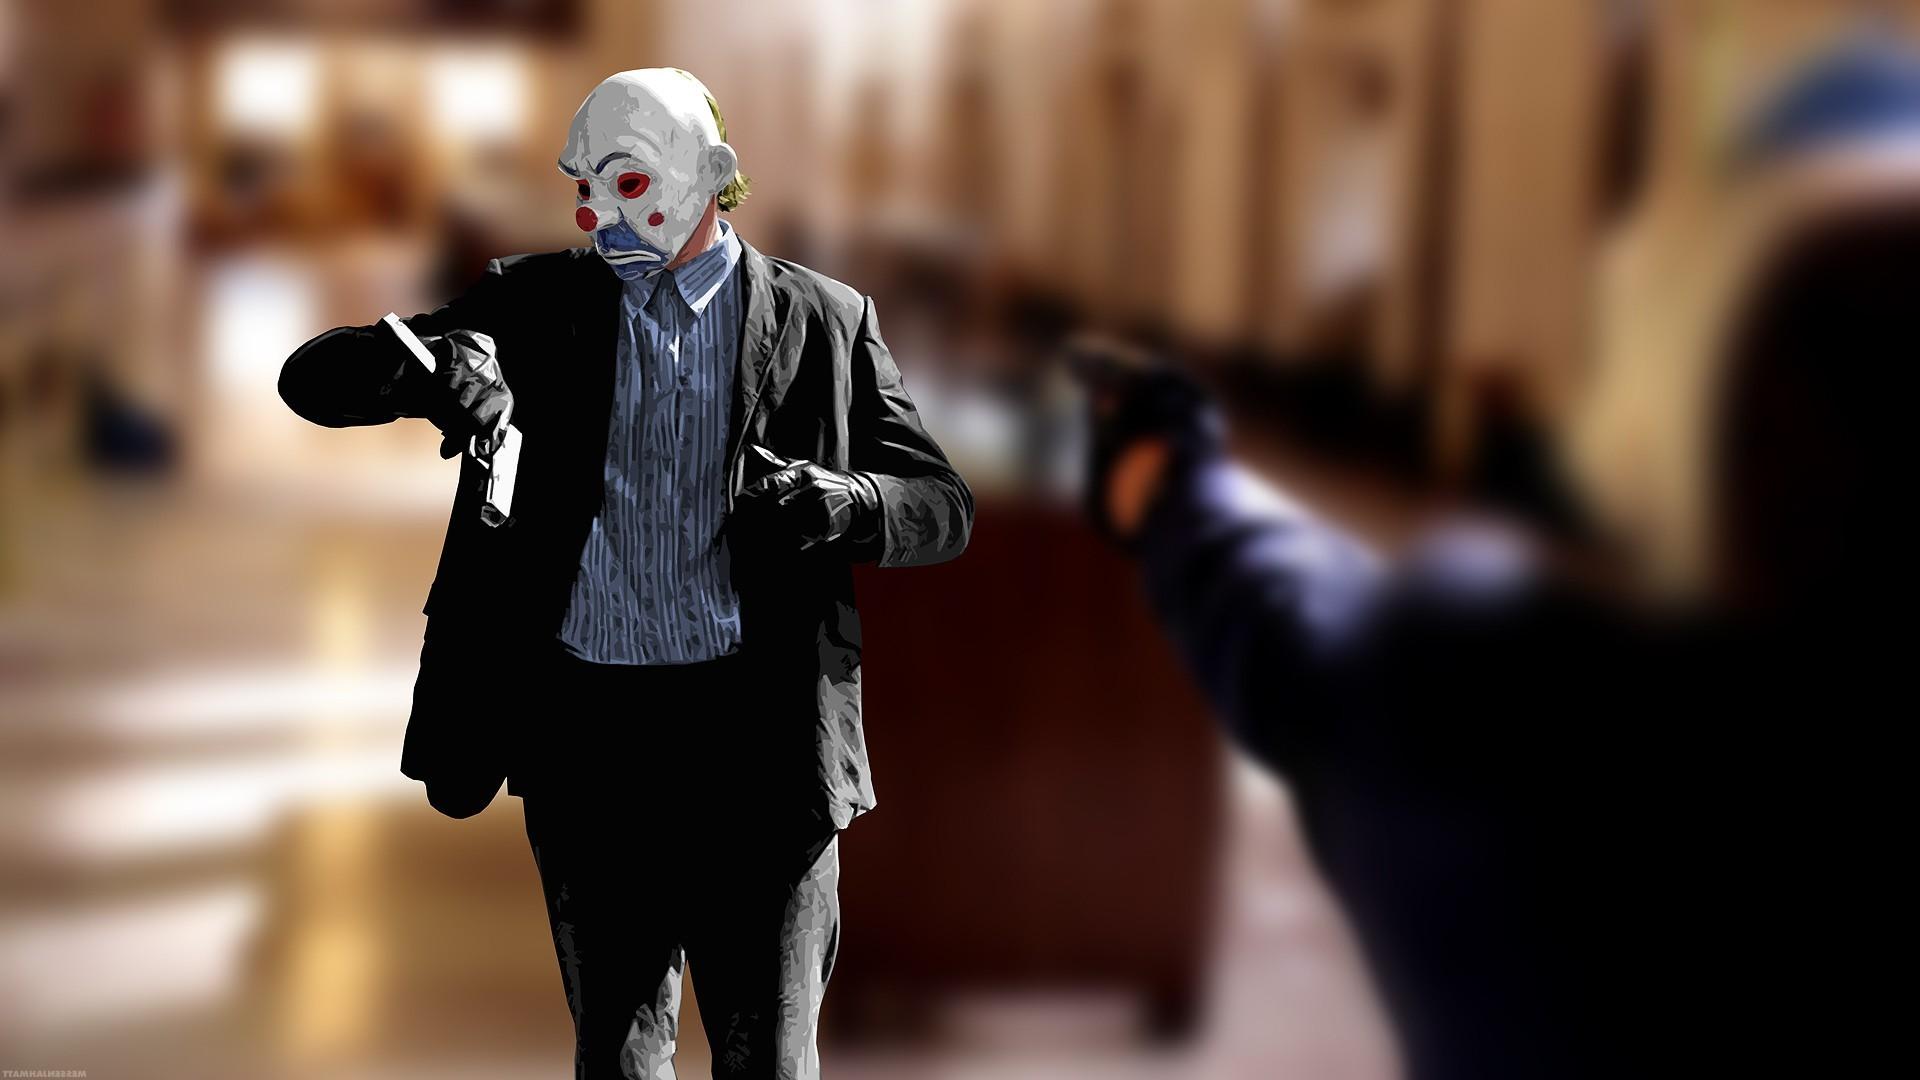 Heath Ledger Joker Wallpaper 1024x768